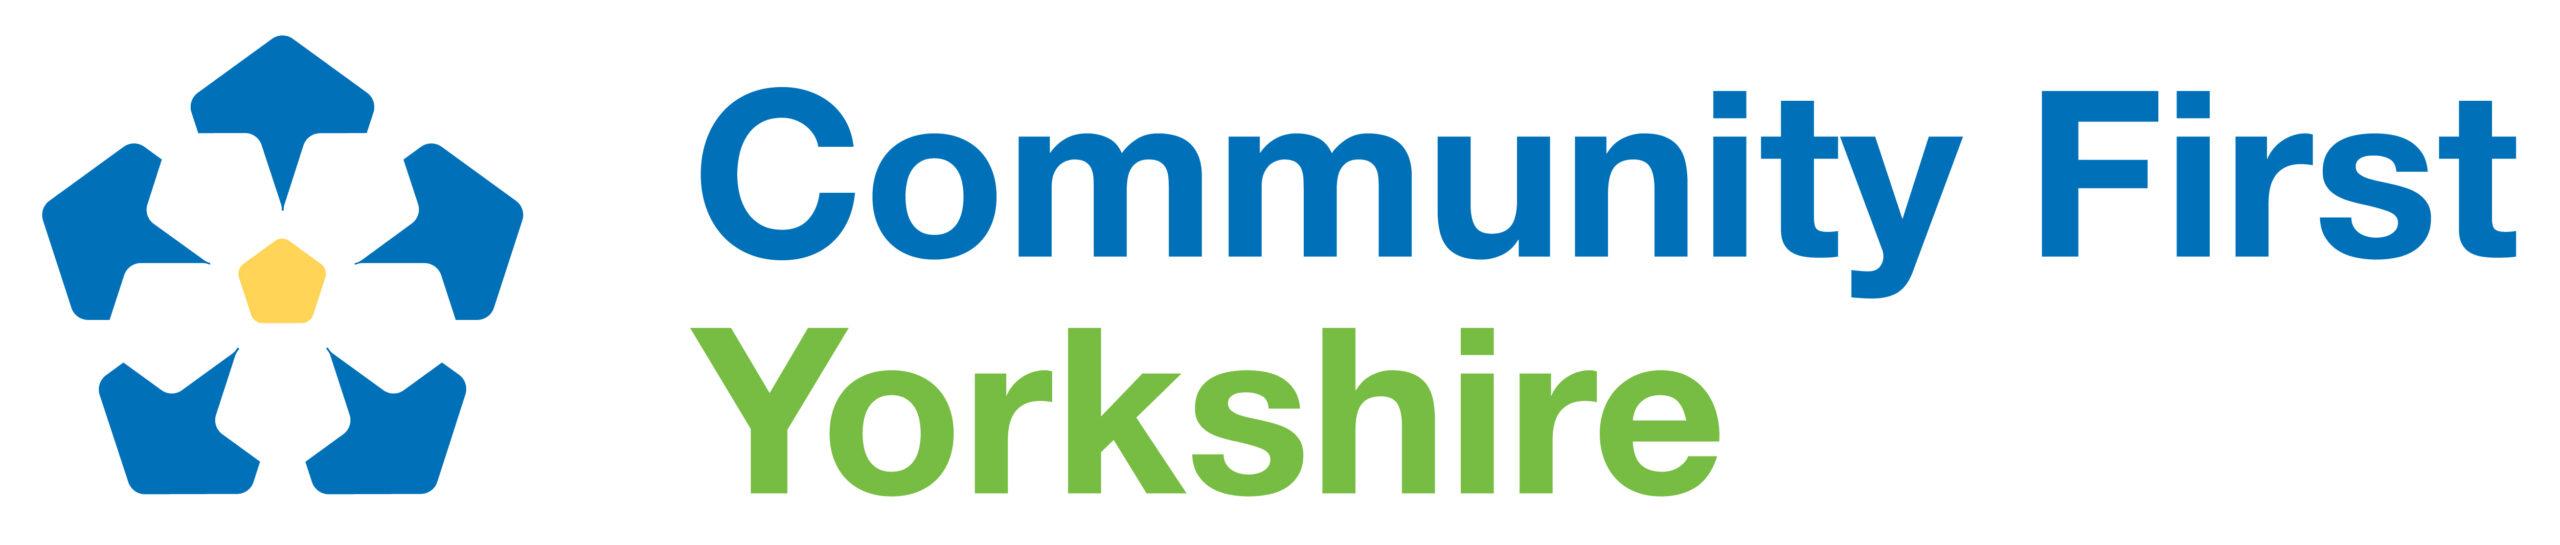 community-first-northyorkshire-link